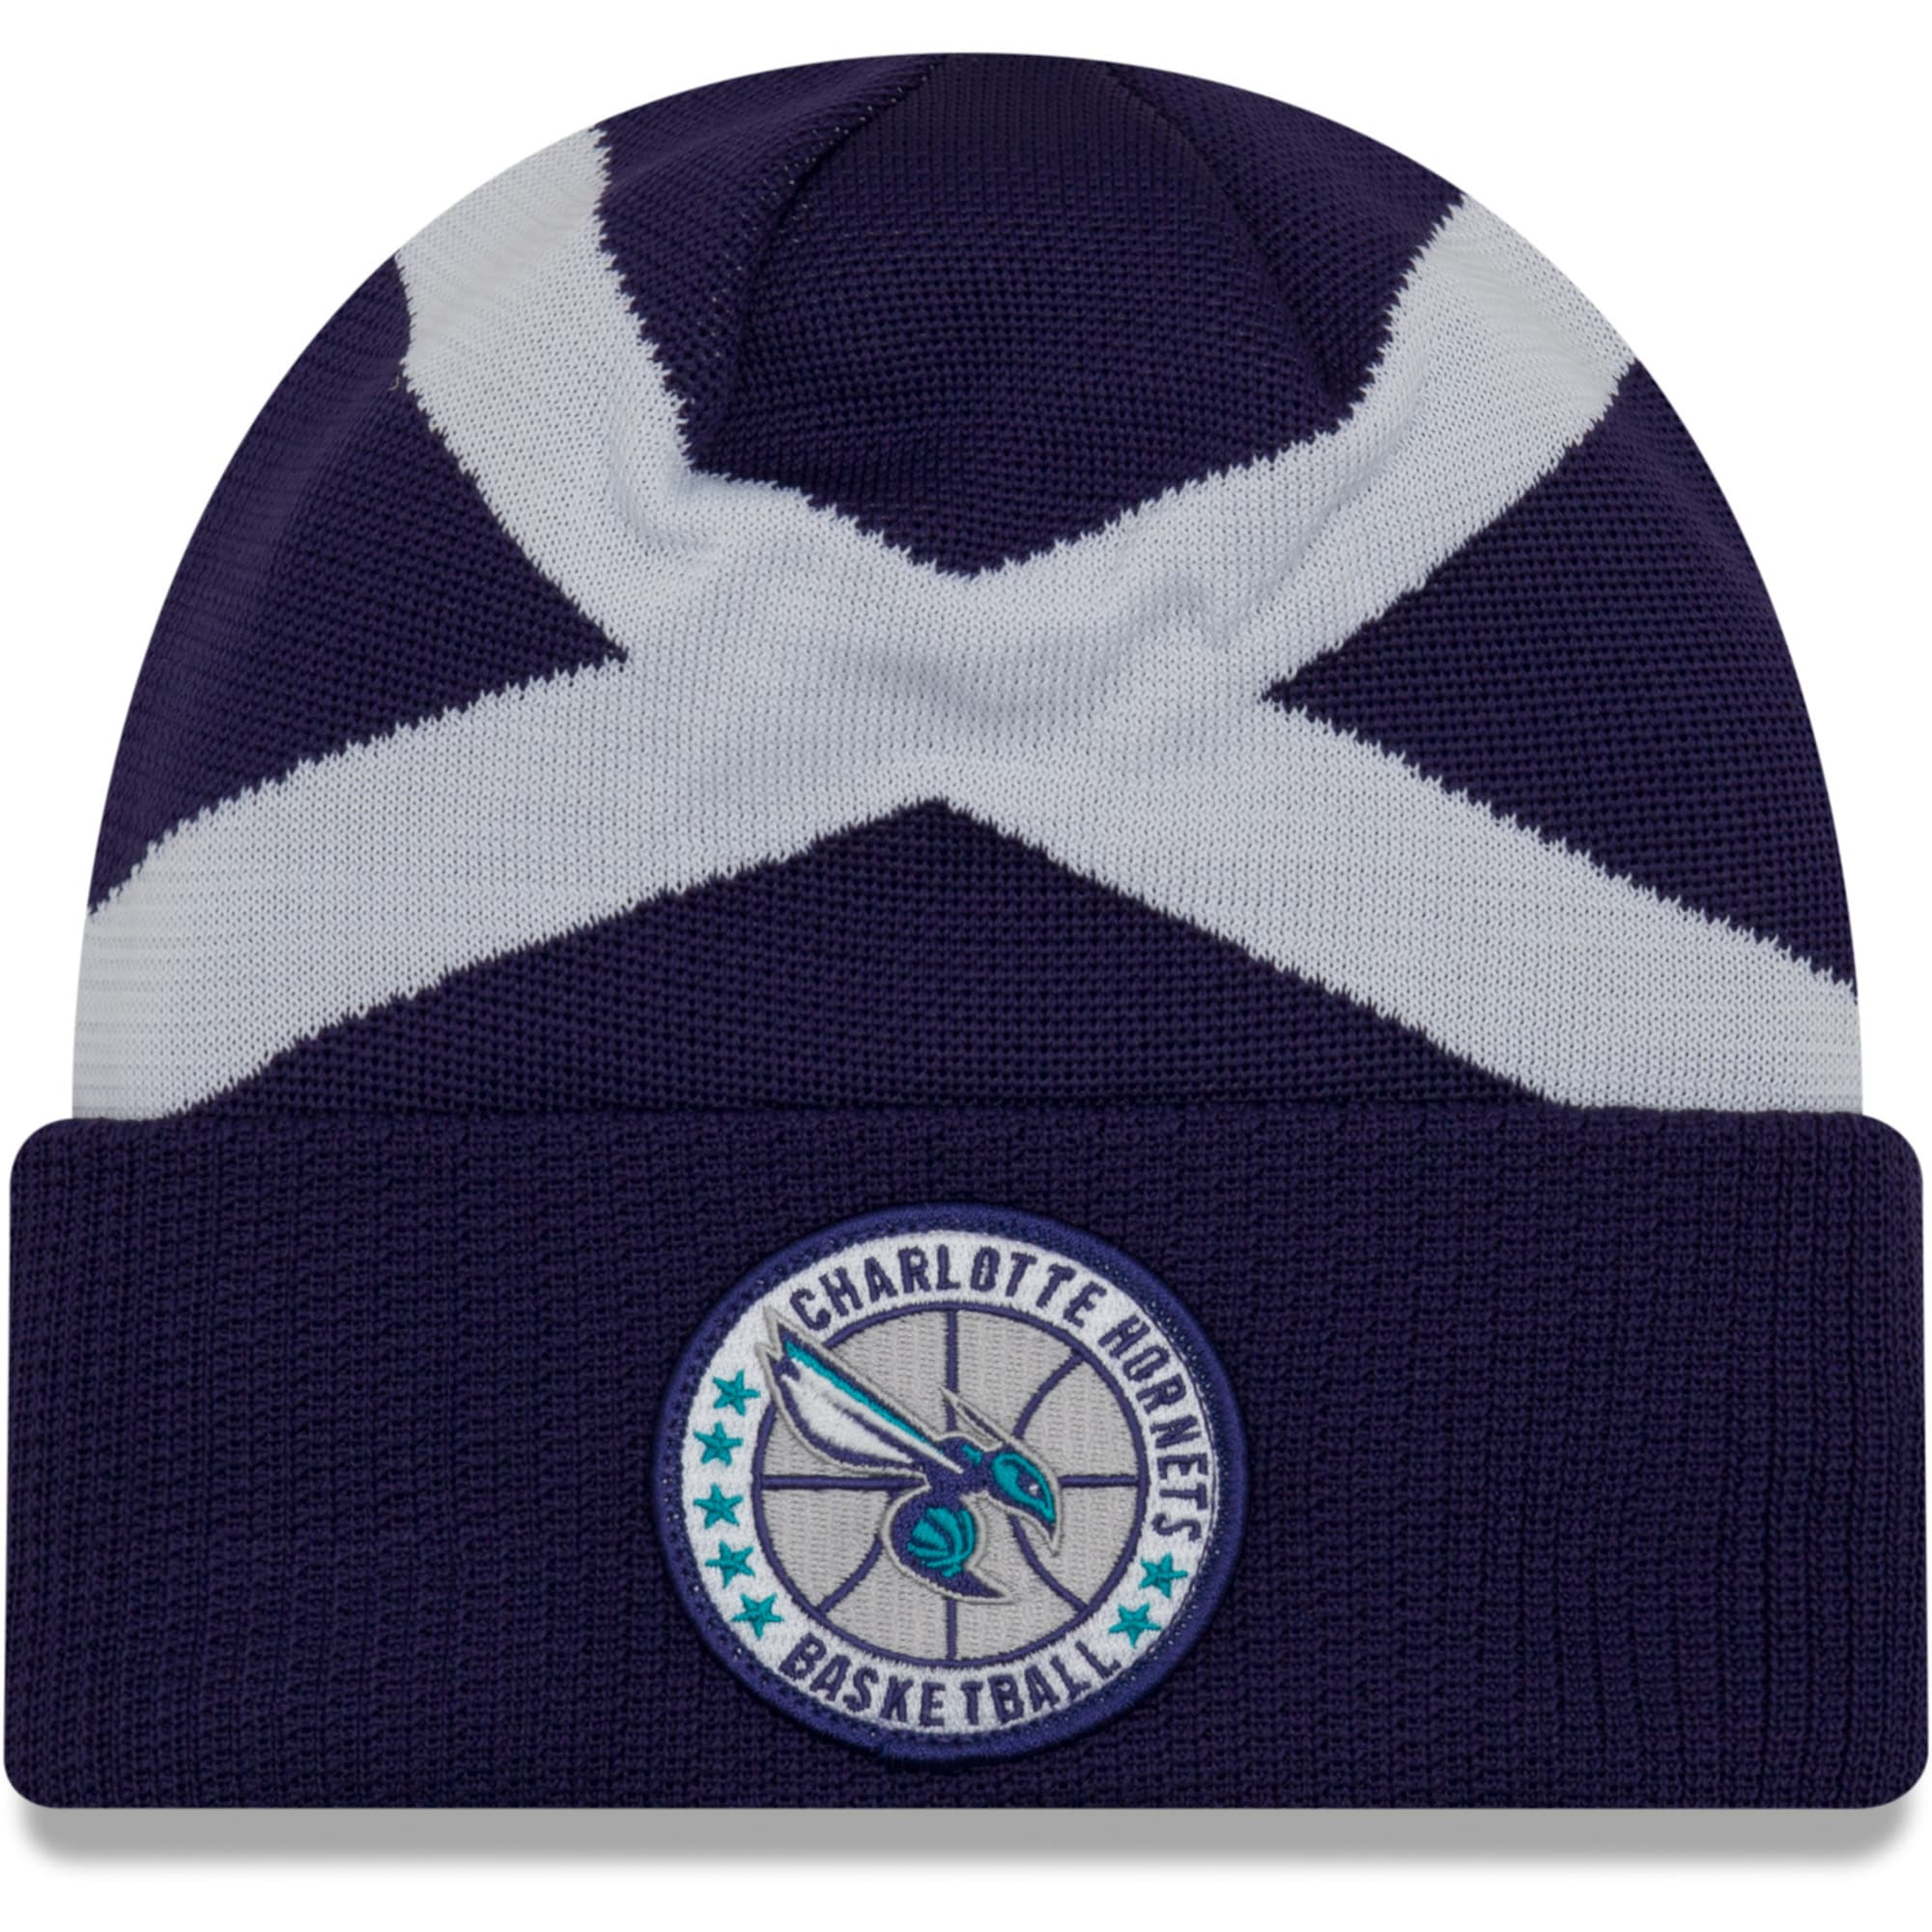 Charlotte Hornets New Era 2018 Tip Off Series Cuffed Knit Hat - Purple